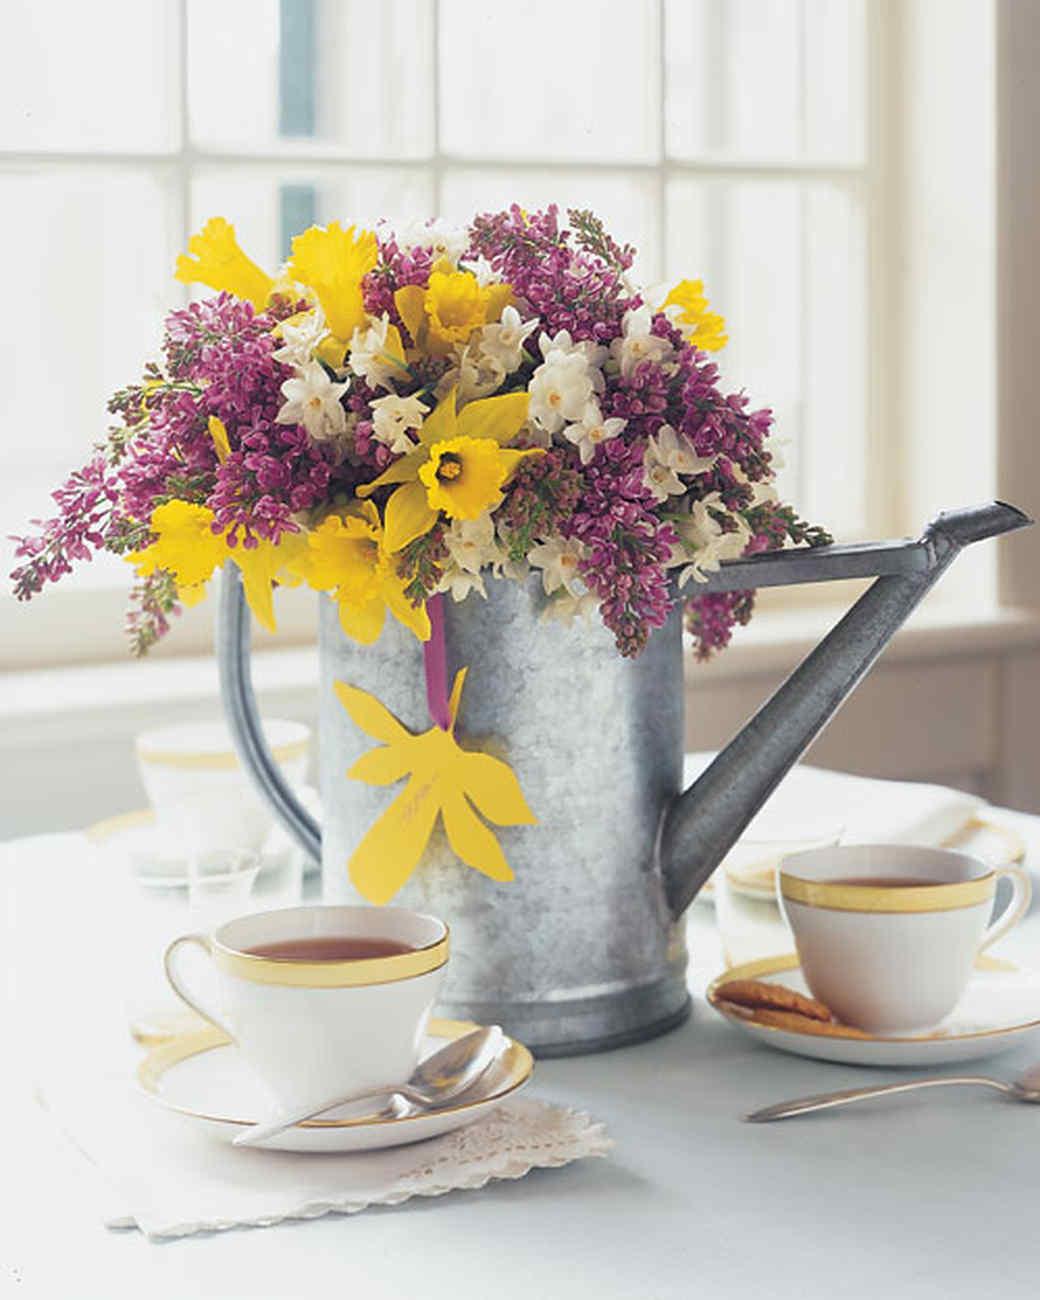 Spring Wedding Centerpiece Ideas: Spring Centerpieces